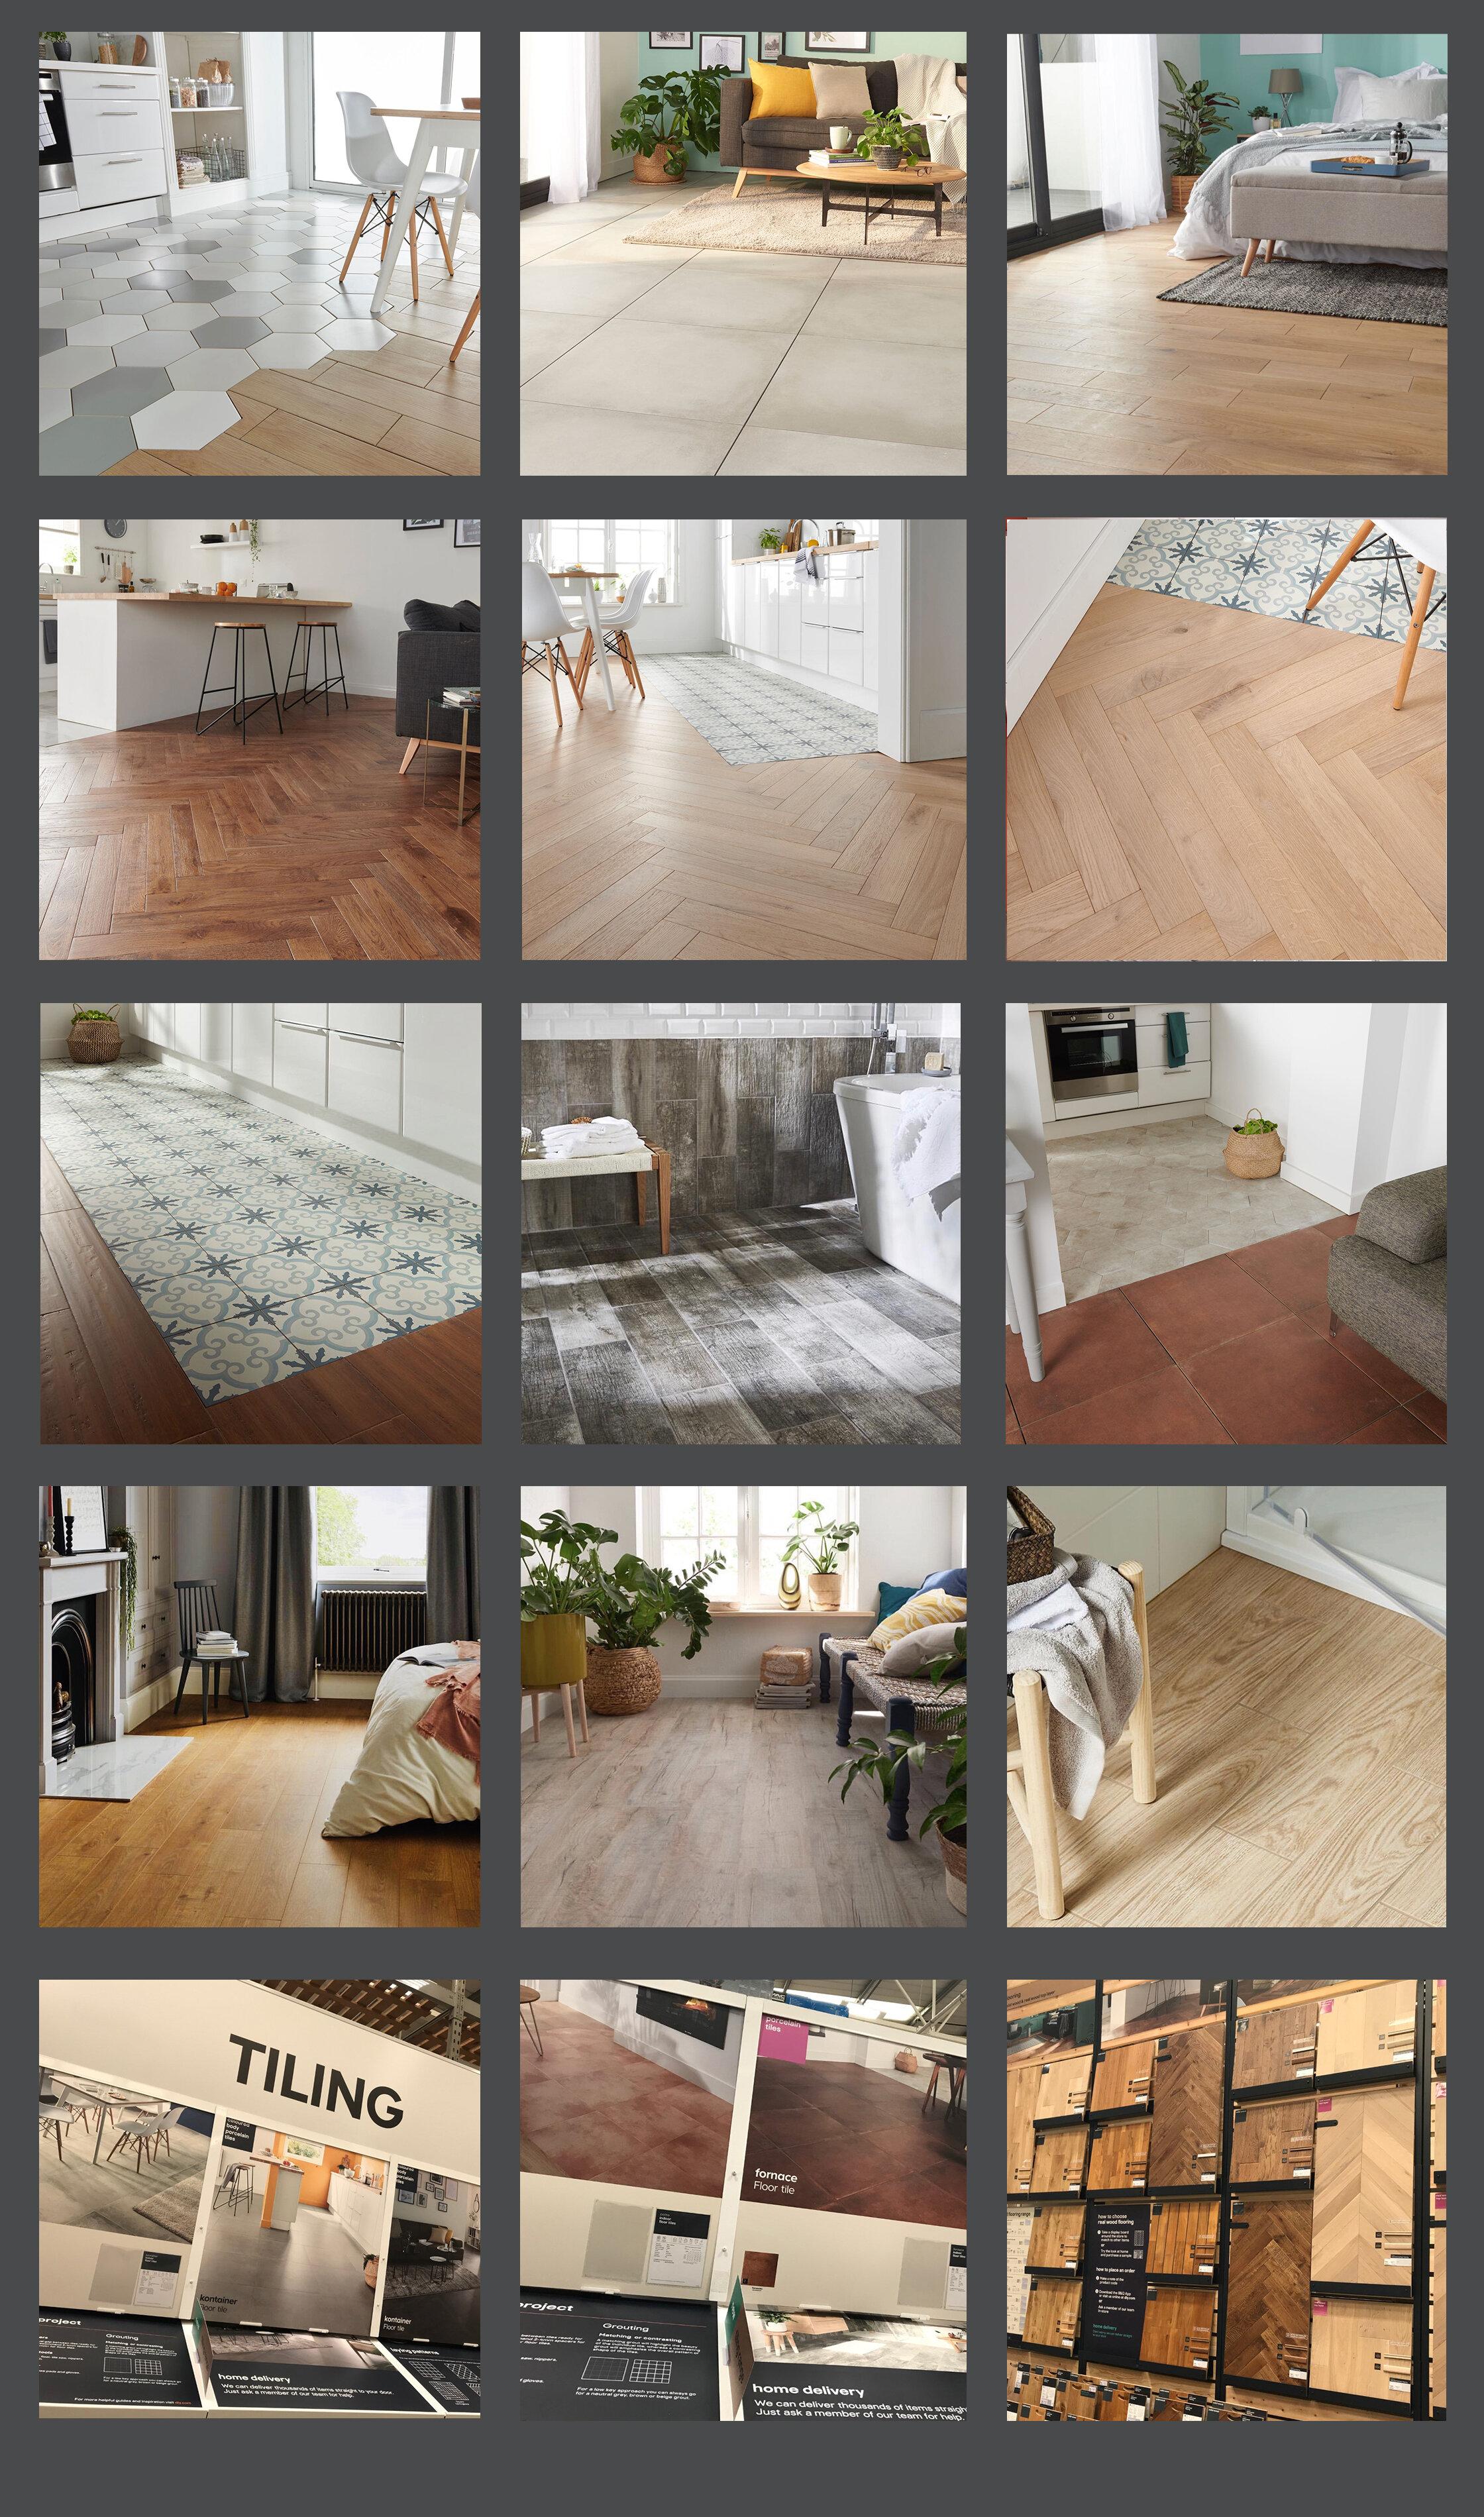 kingfisher_flooring_new.jpg